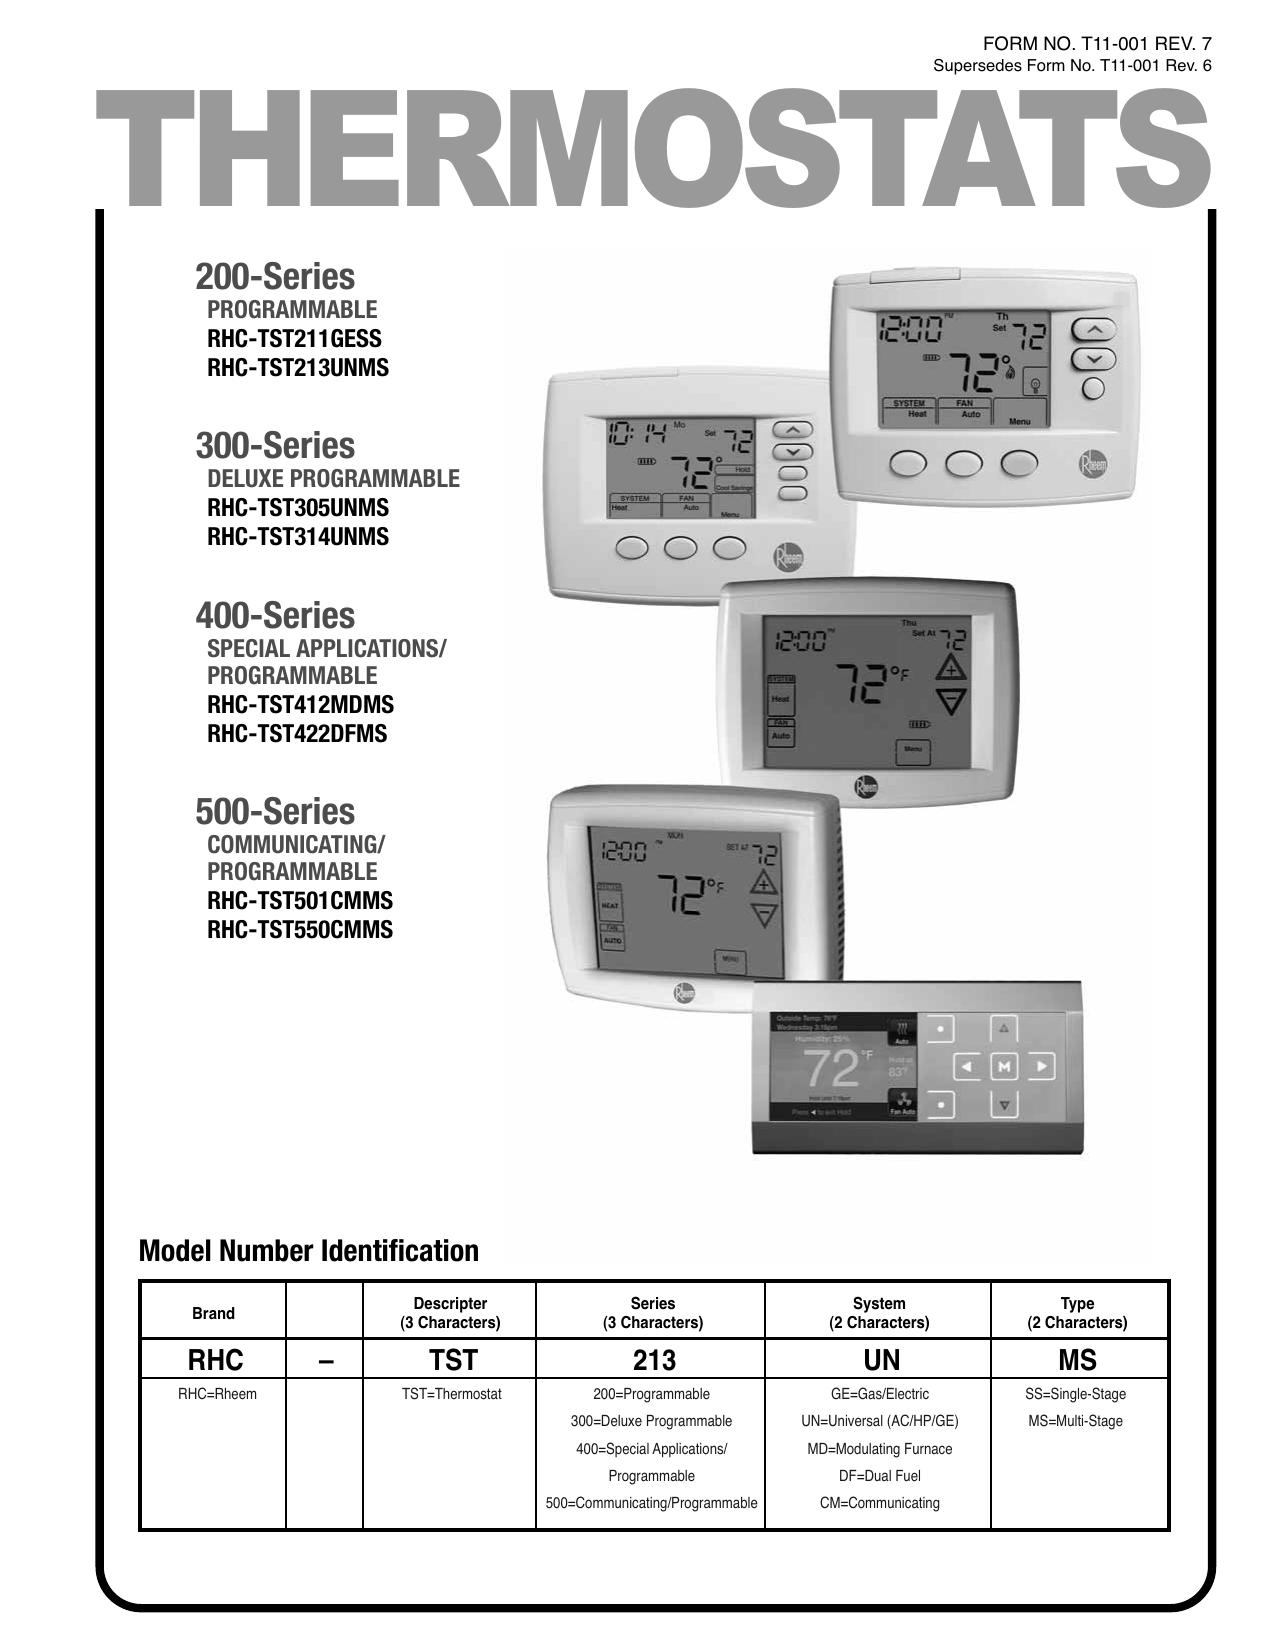 rheem operating manual manualzz com rh manualzz com Rheem Programmable Thermostat Rheem 2 Stage Thermostat